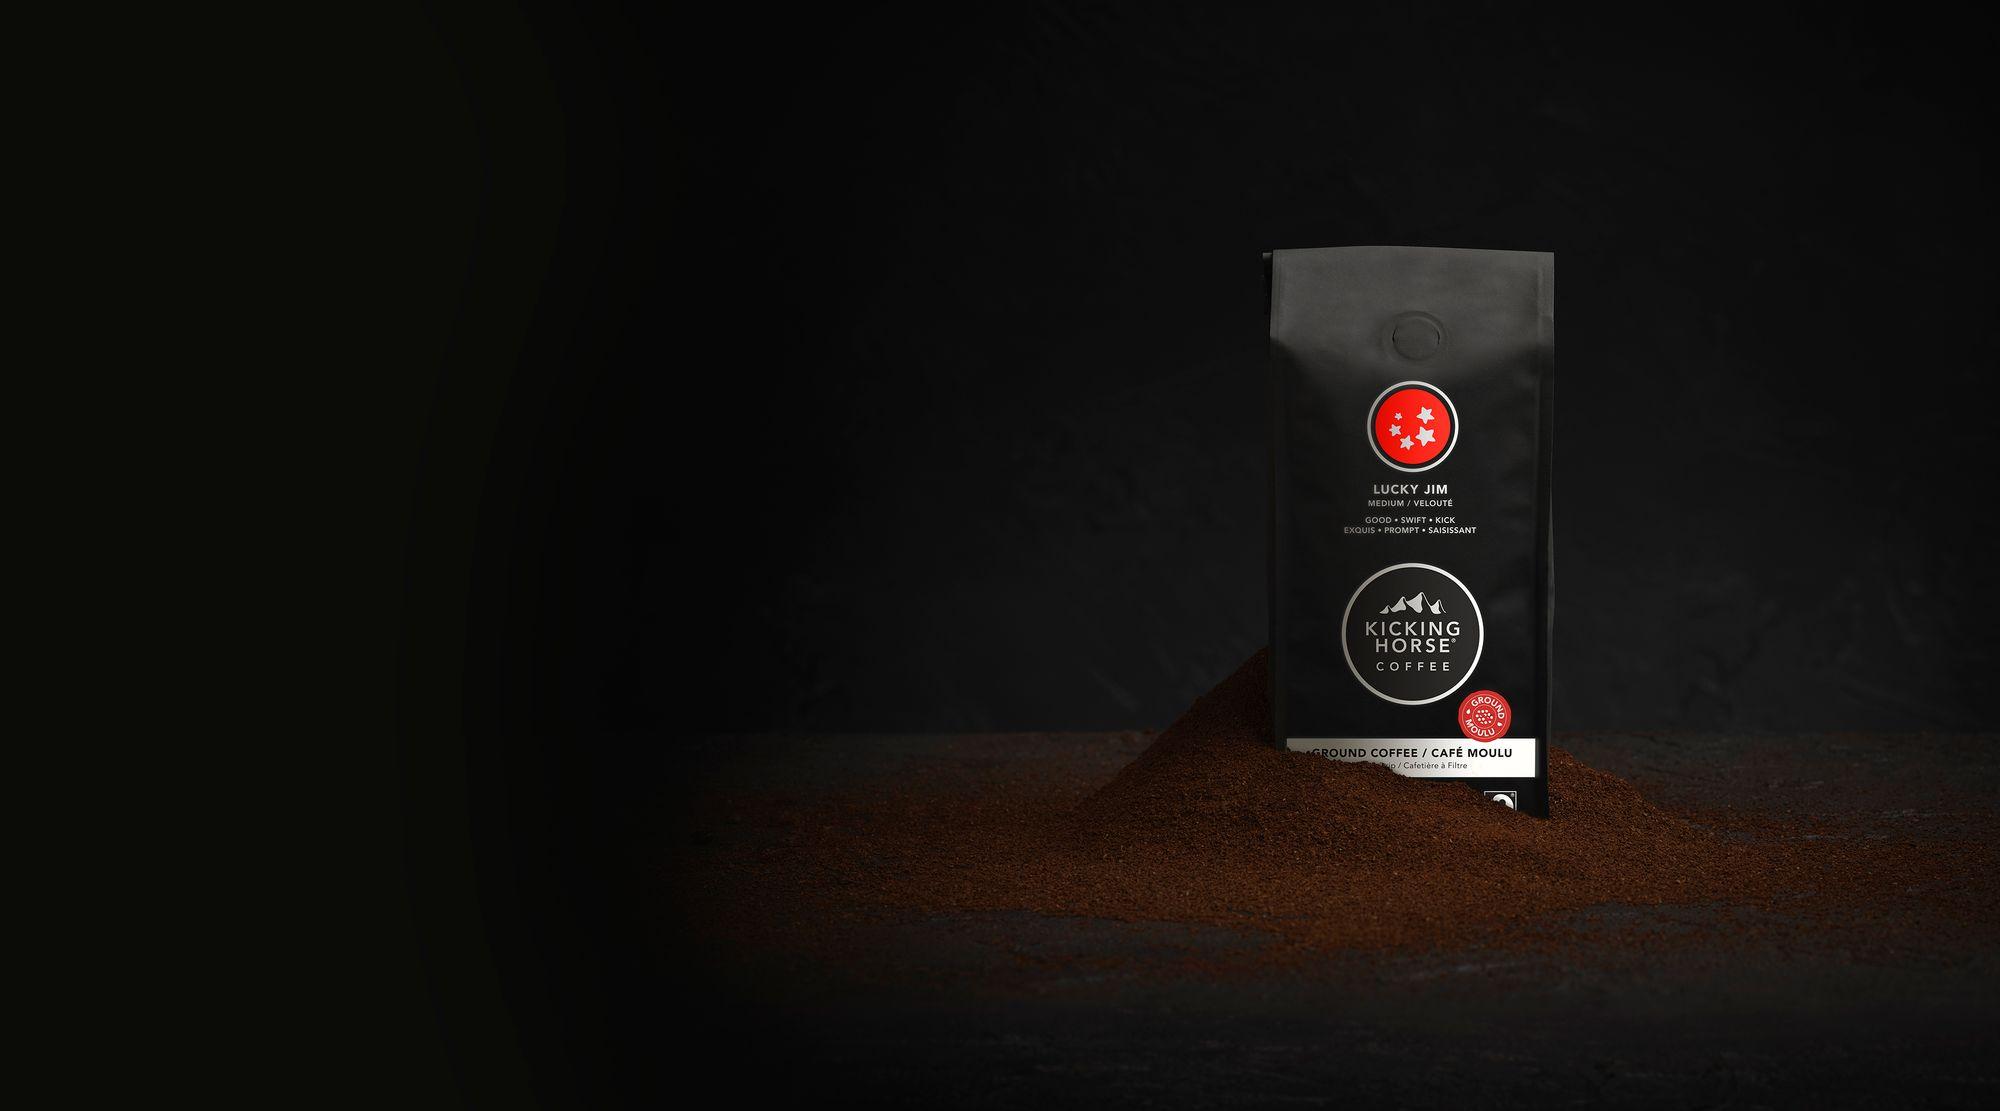 Lucky Jim ground coffee